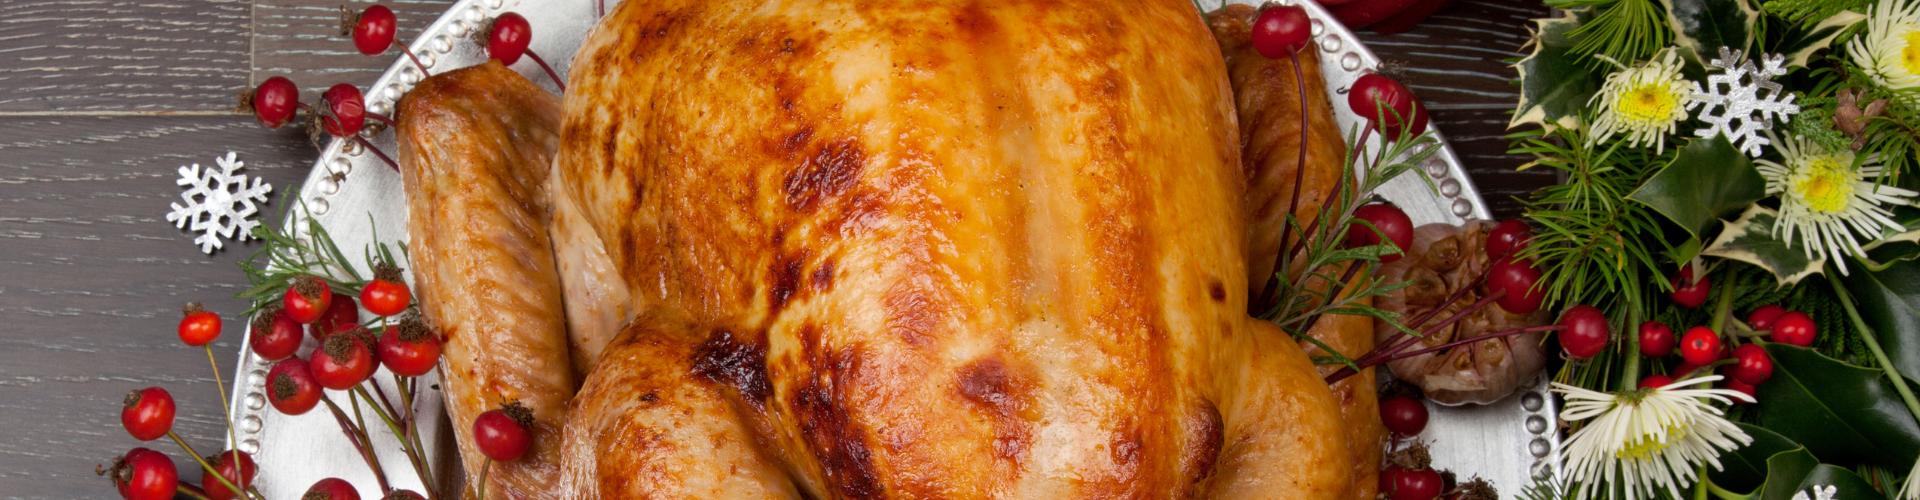 Cooking Turkeys